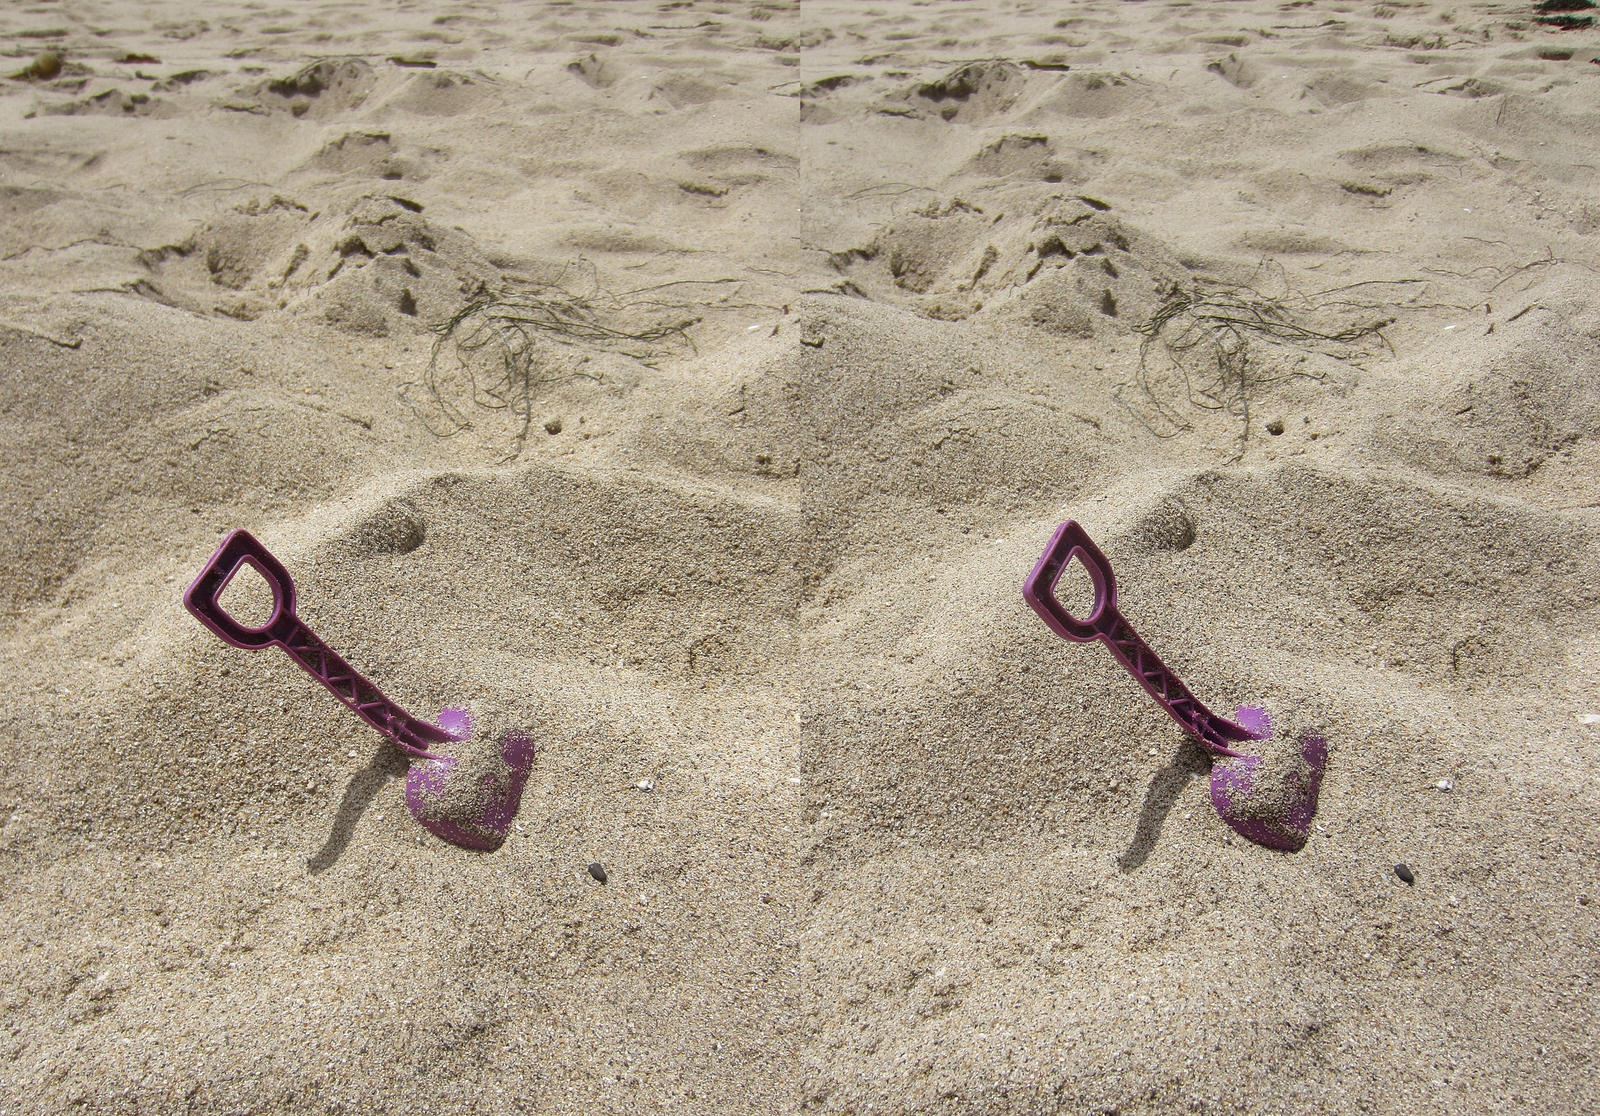 Stereograph - Shovel by alanbecker